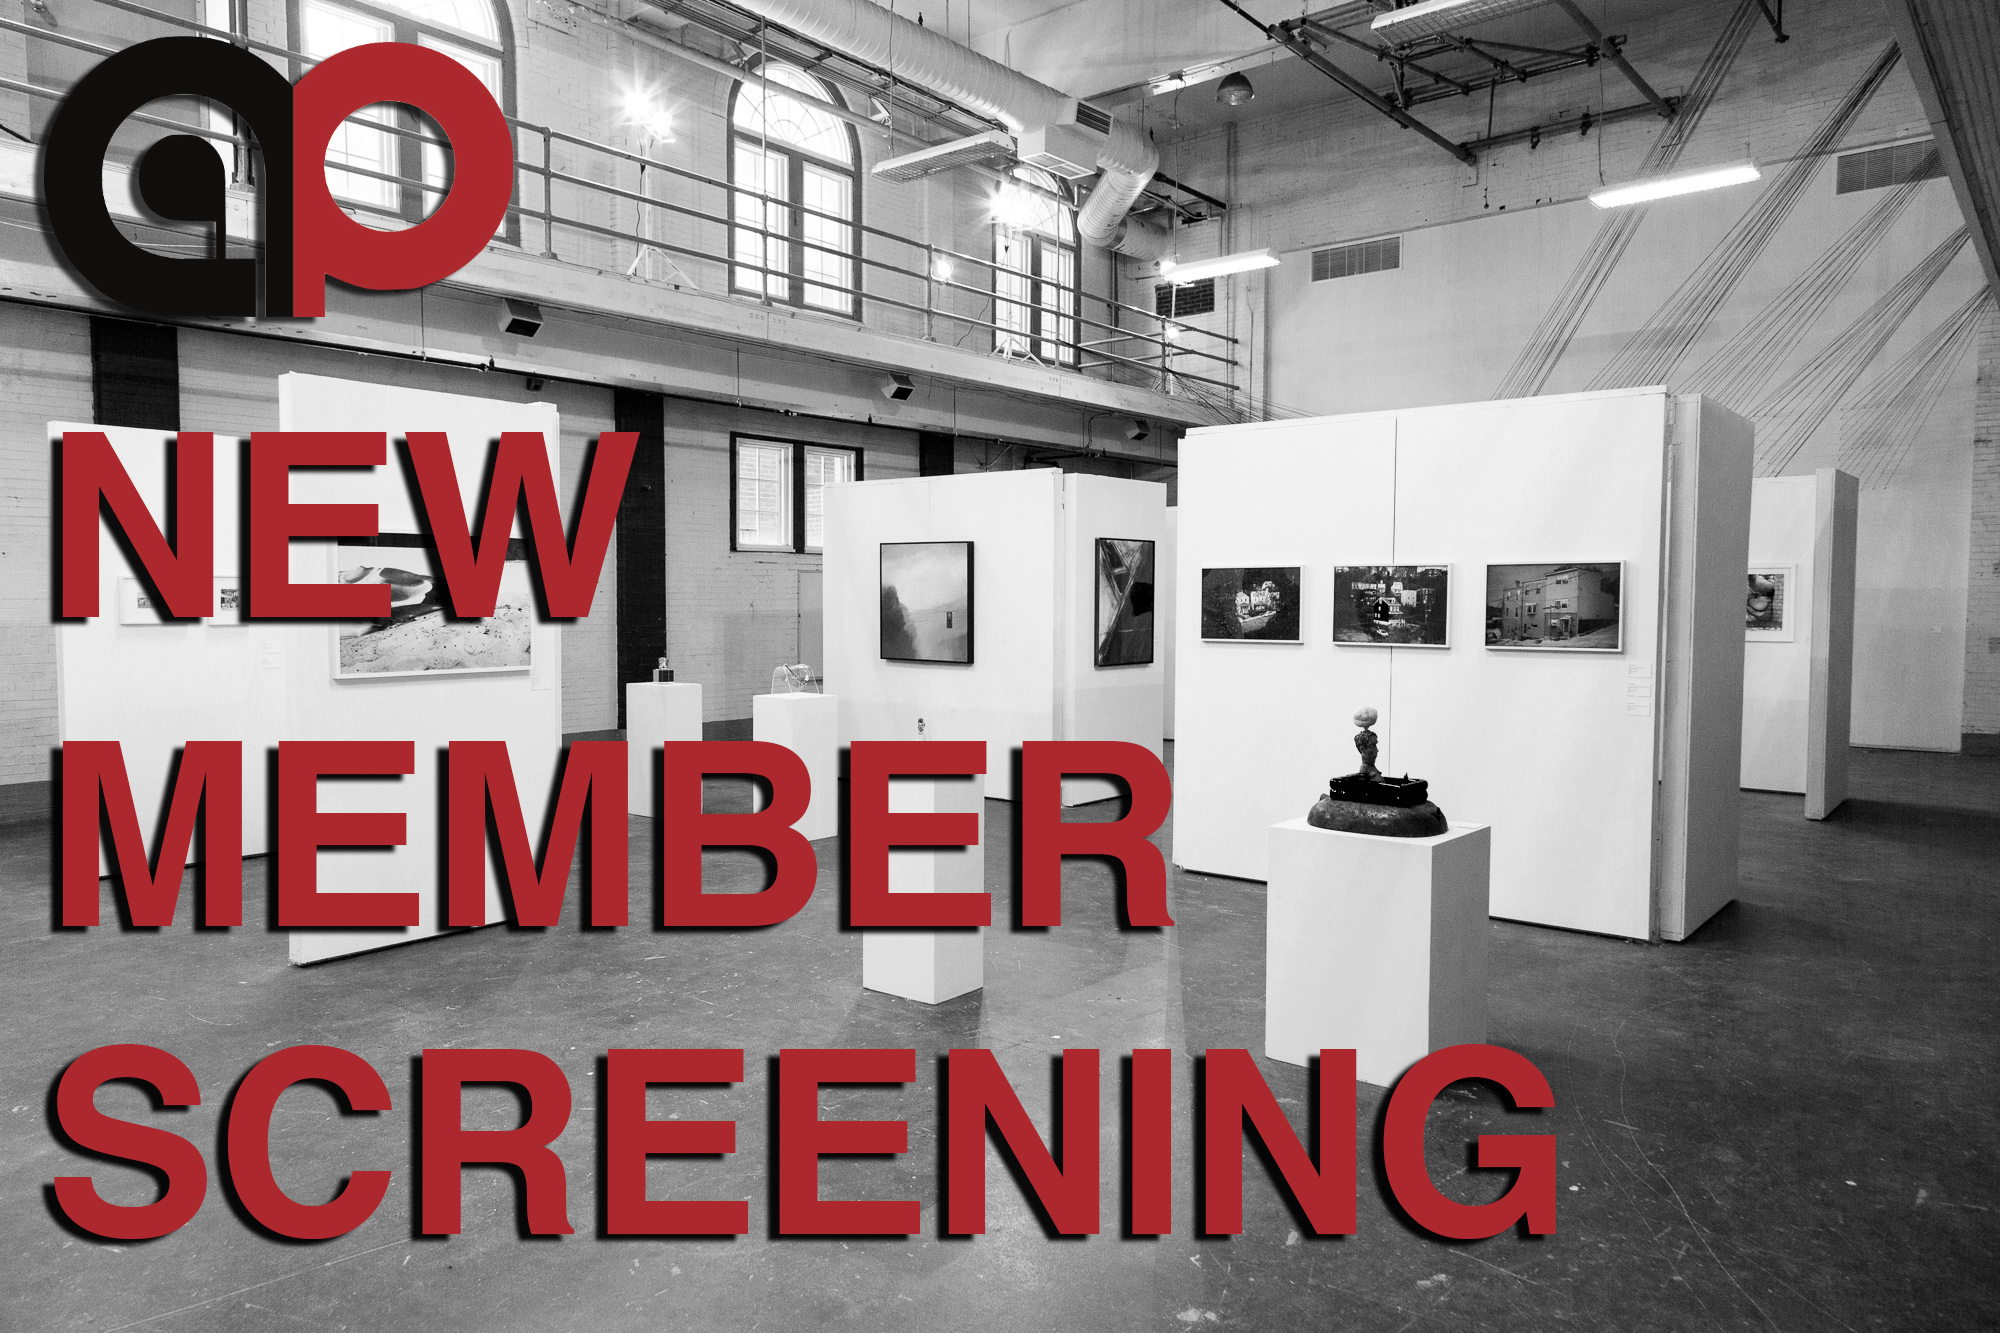 2019 new member screening.jpg